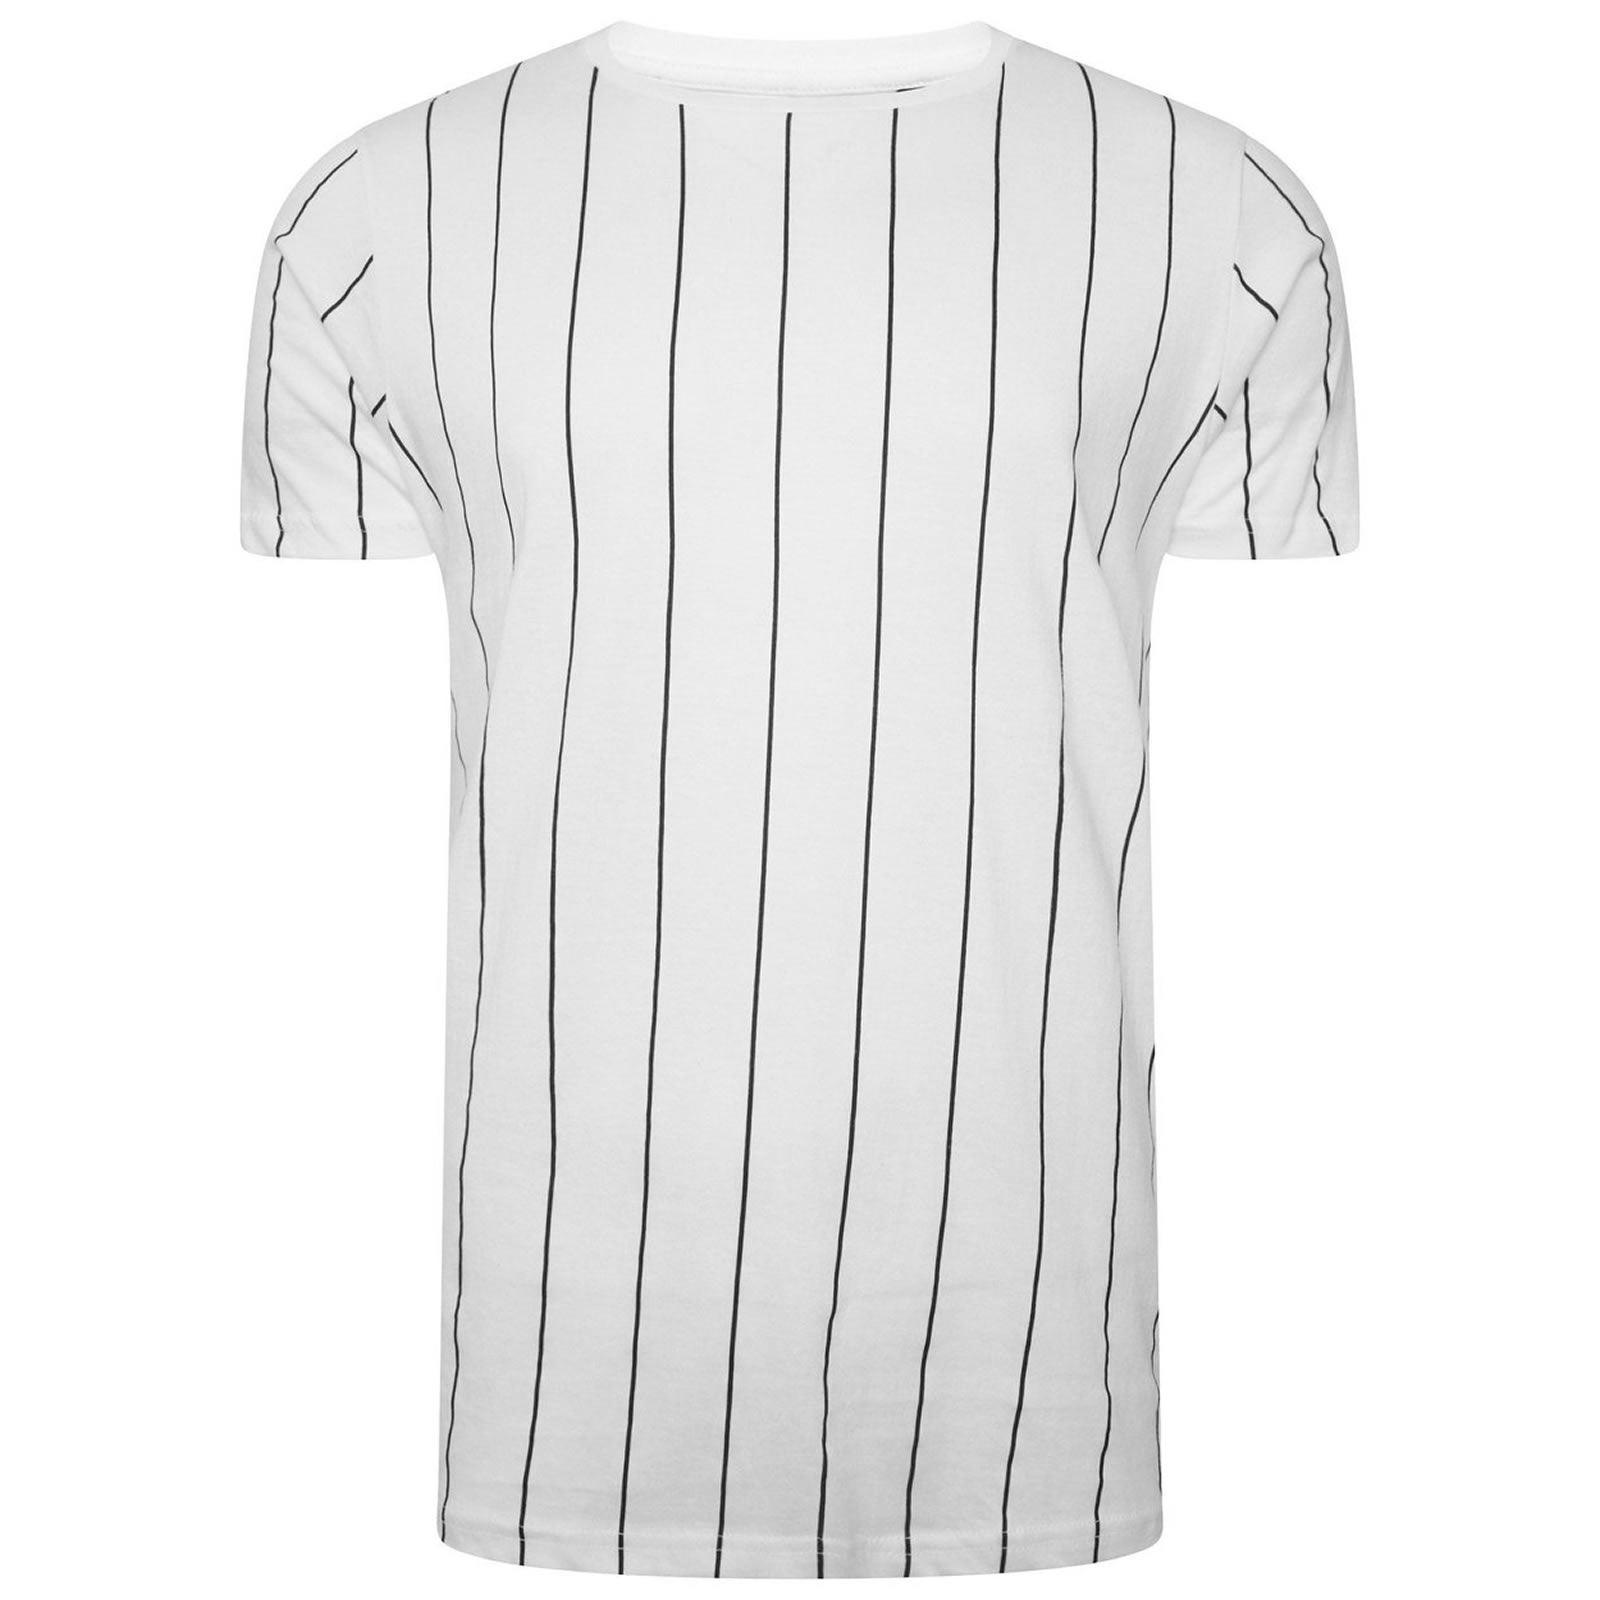 Hommes-T-Shirt-Brave-Soul-Stobart-a-encolure-ras-du-cou-a-manches-courtes-a-rayures-verticales-Tee miniature 4